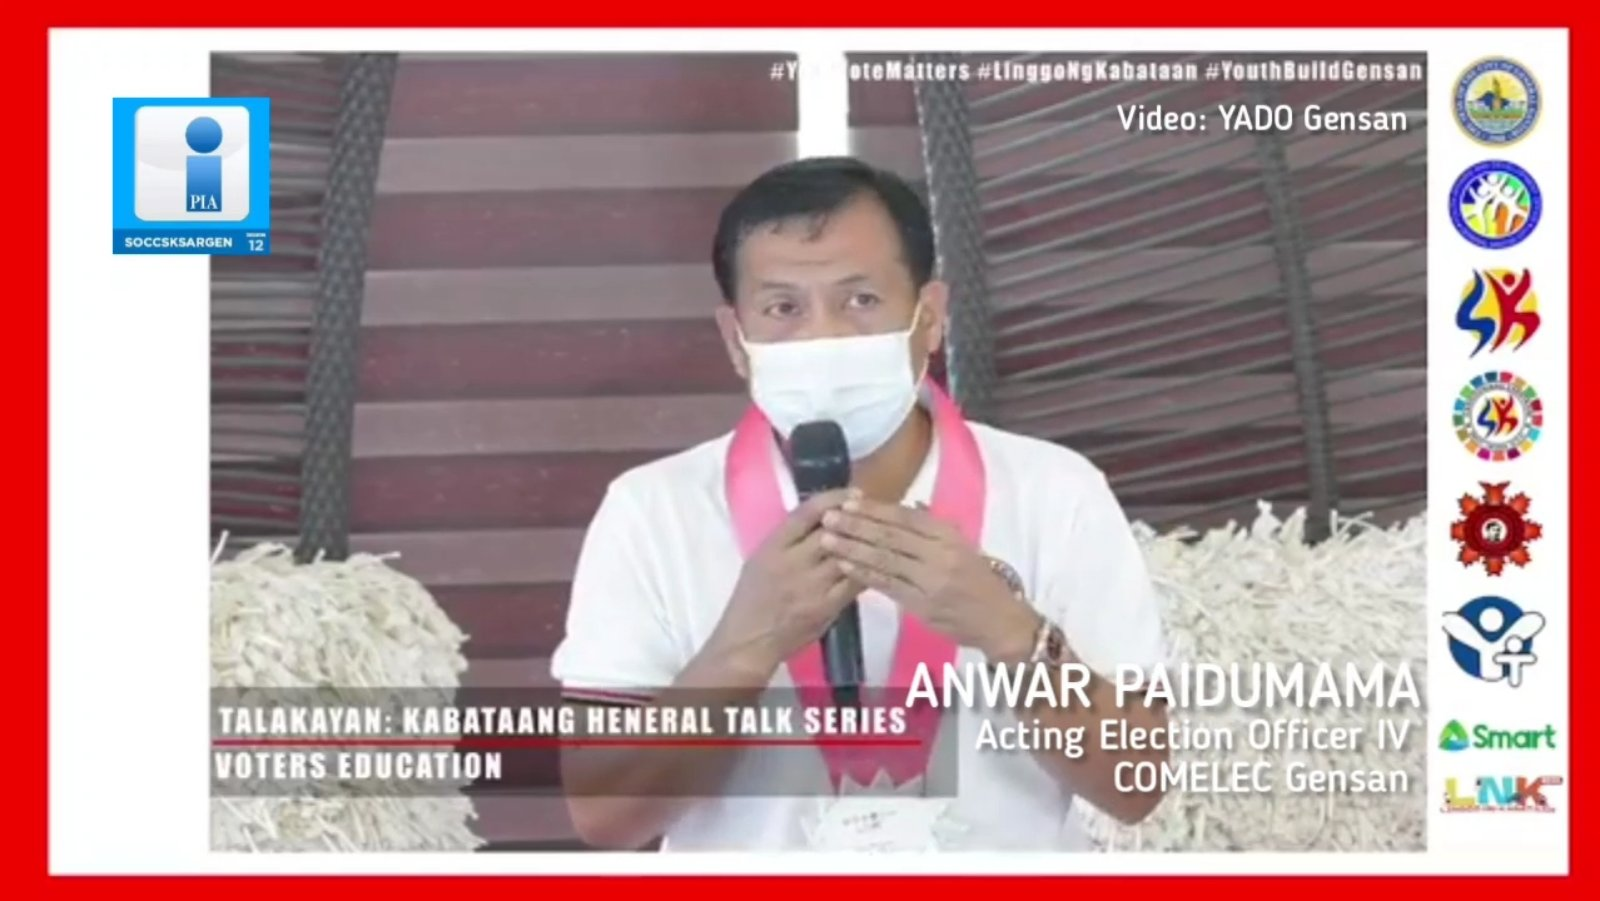 COMELEC Gensan naglunsad ng off-site voter's registration areas